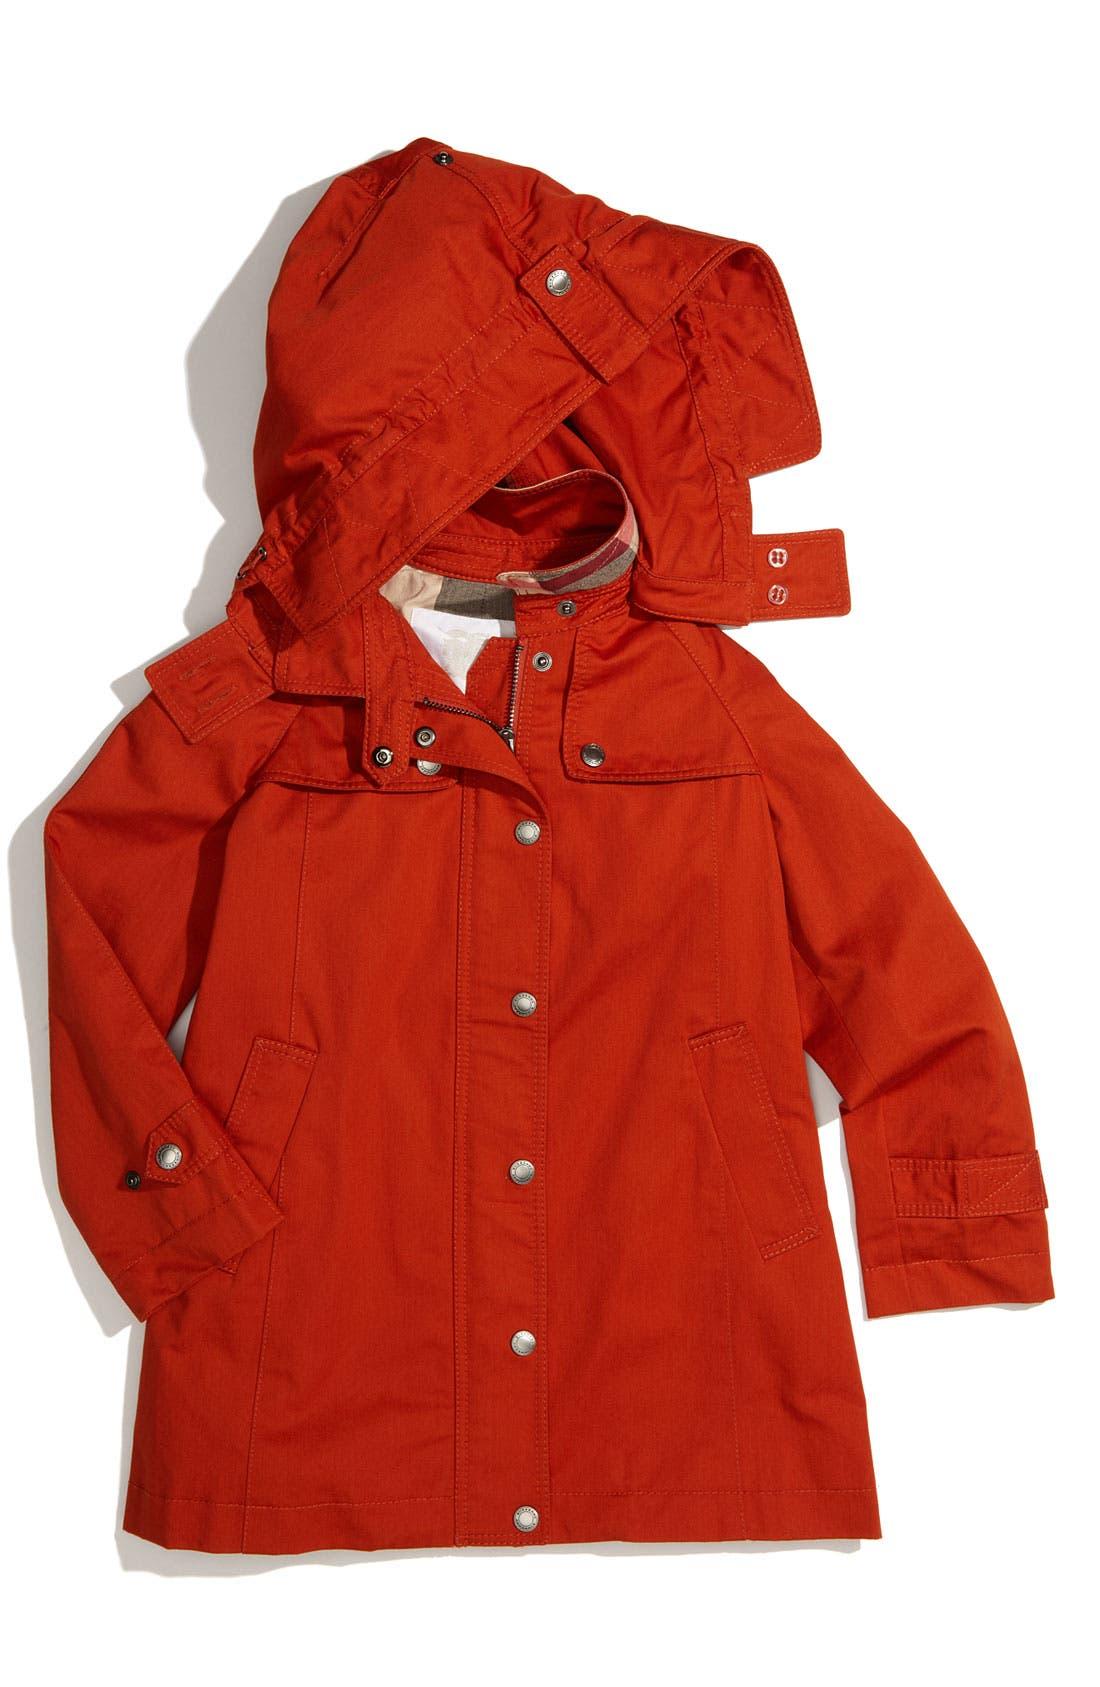 Alternate Image 1 Selected - Burberry Hooded Trench Coat (Little Girls)